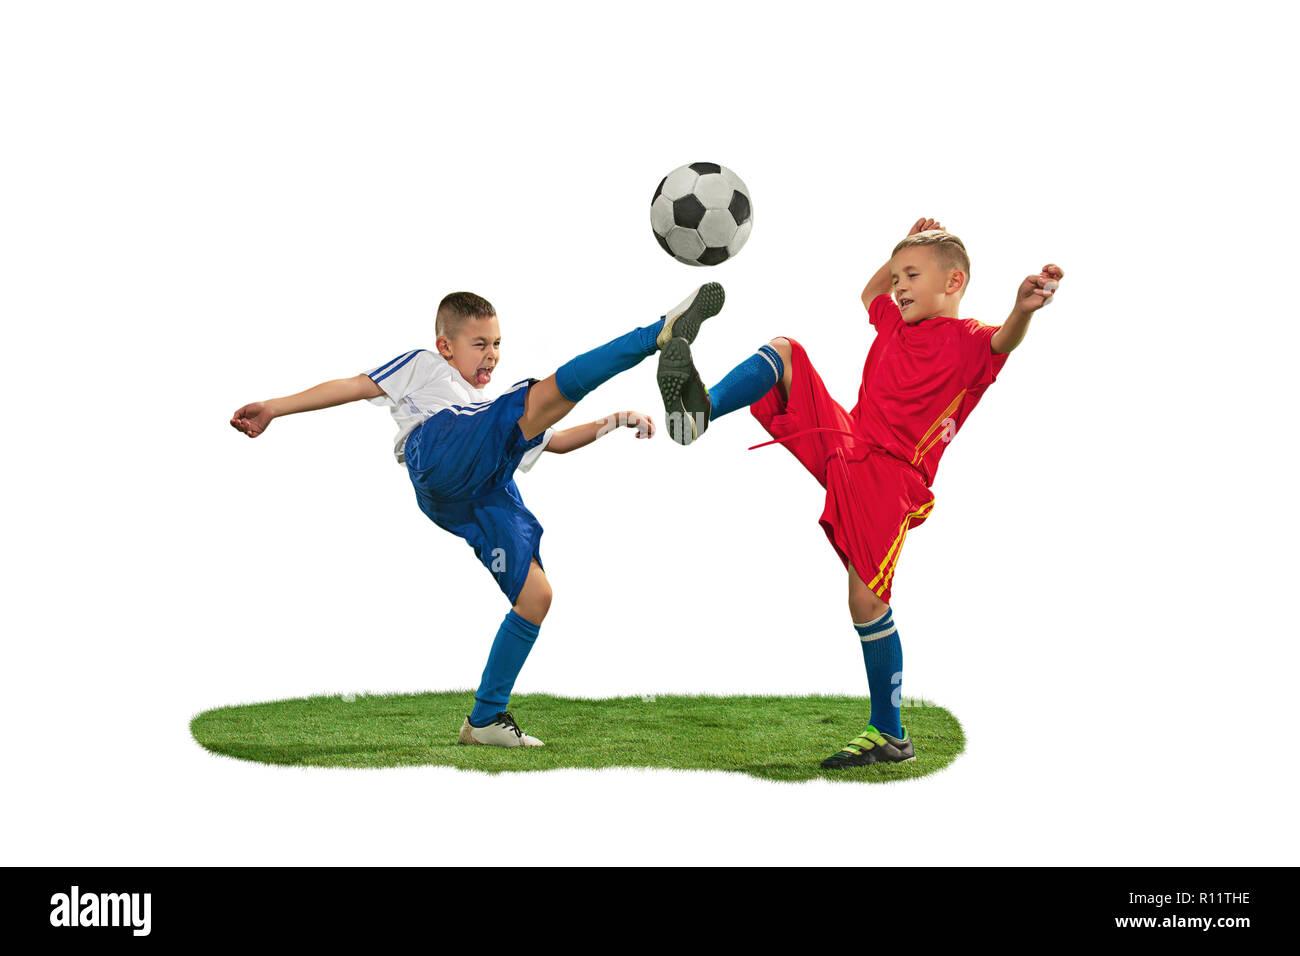 Soccer Player Doing Kick Ball Imágenes De Stock   Soccer Player ... 31e4a181b5b61